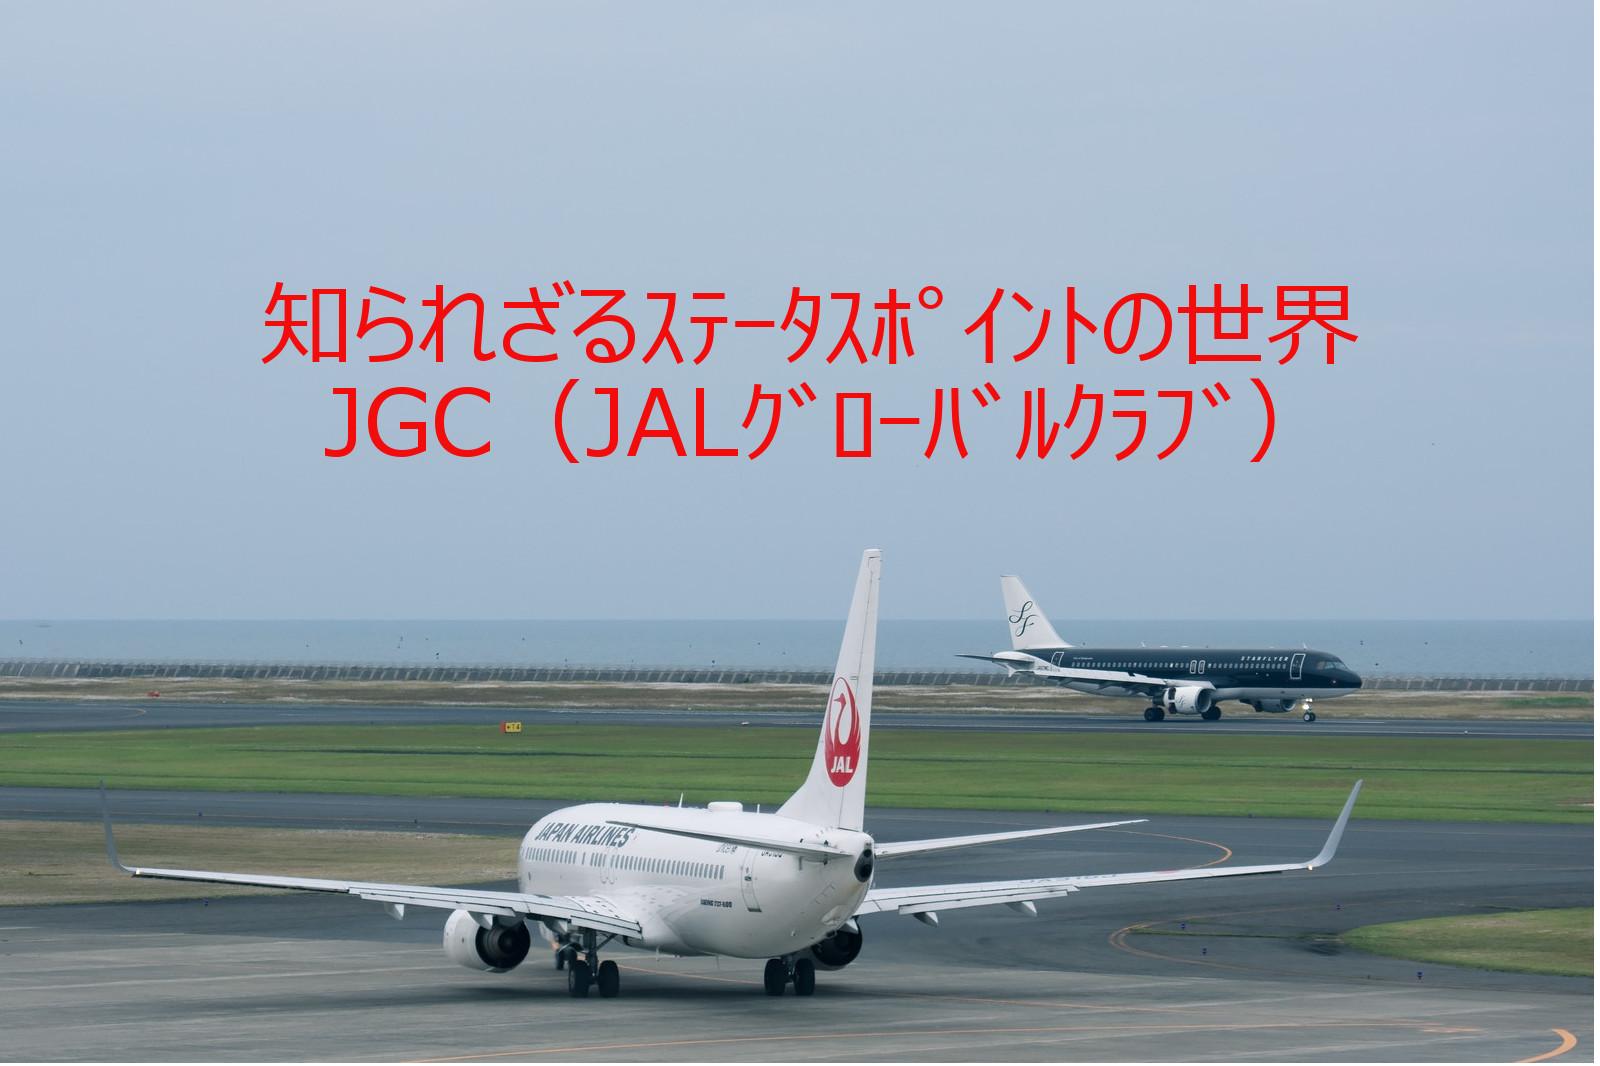 JGC家族カードを更新 年会費10,000円(税別)コロナ過で安いのか?高いのか? 皆さんの選択は!? イメージ画像